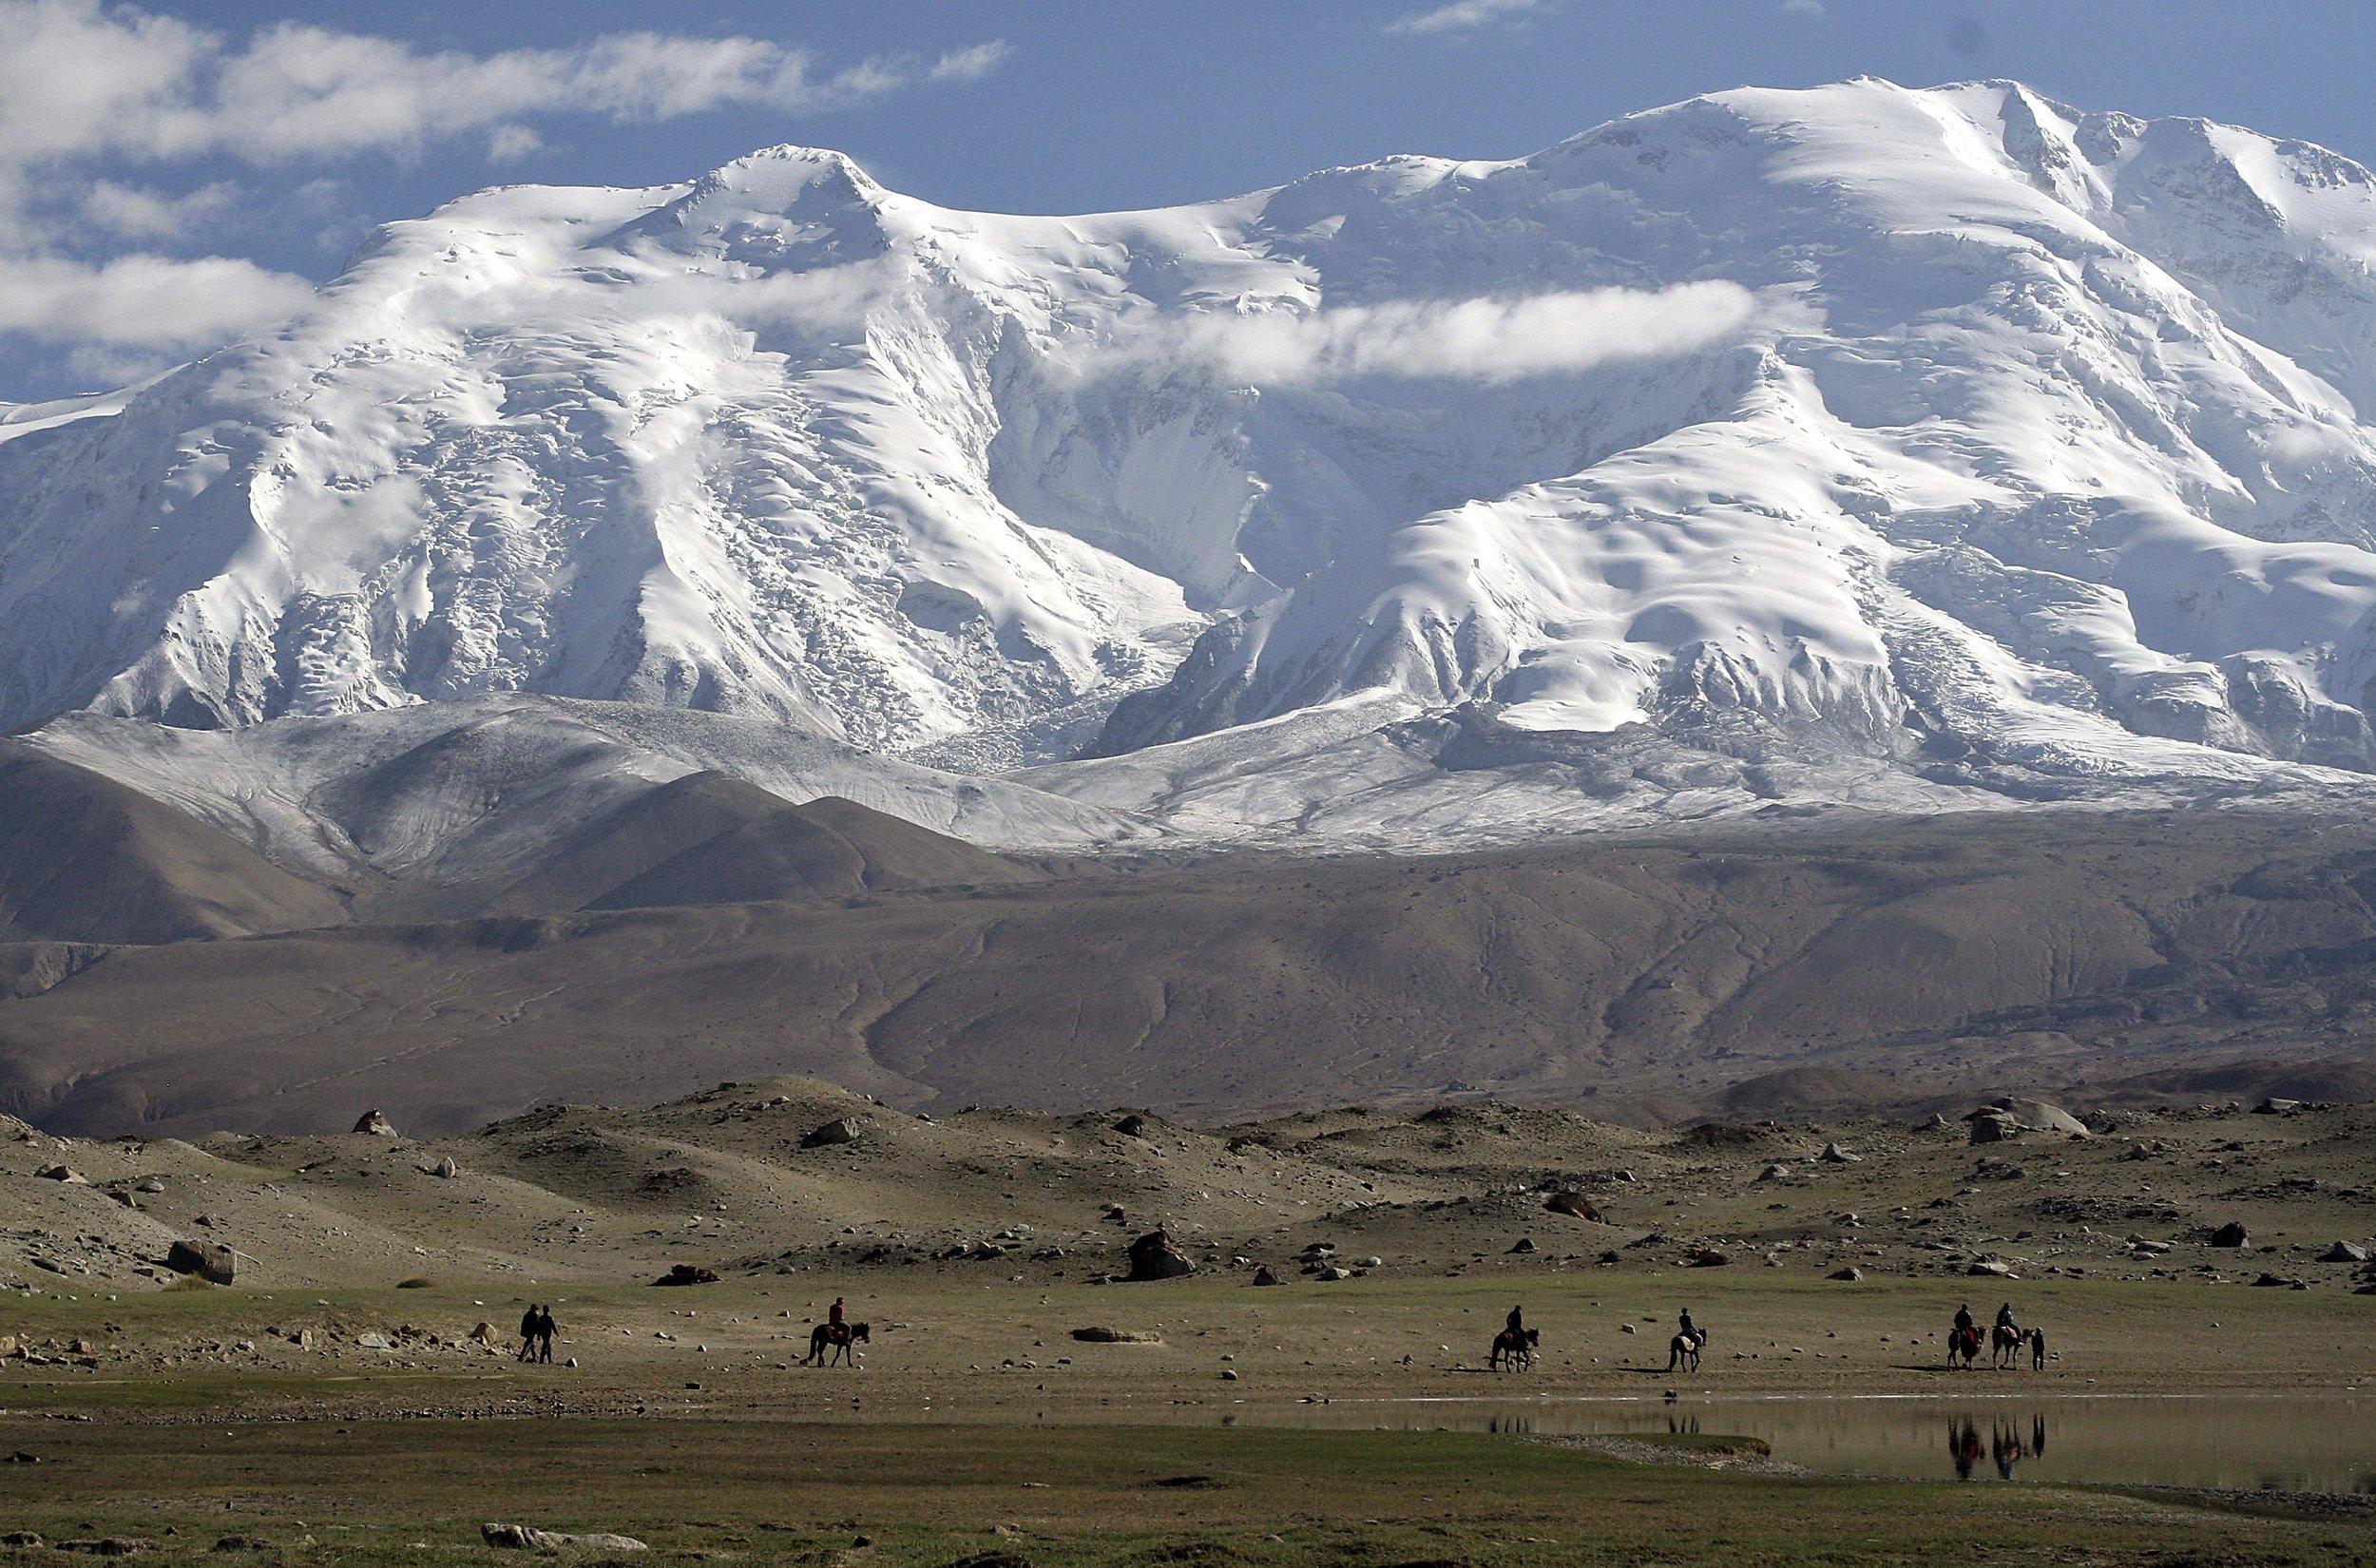 The Kunlun Shan (https://www.summitpost.org/kunlun-shan/171011